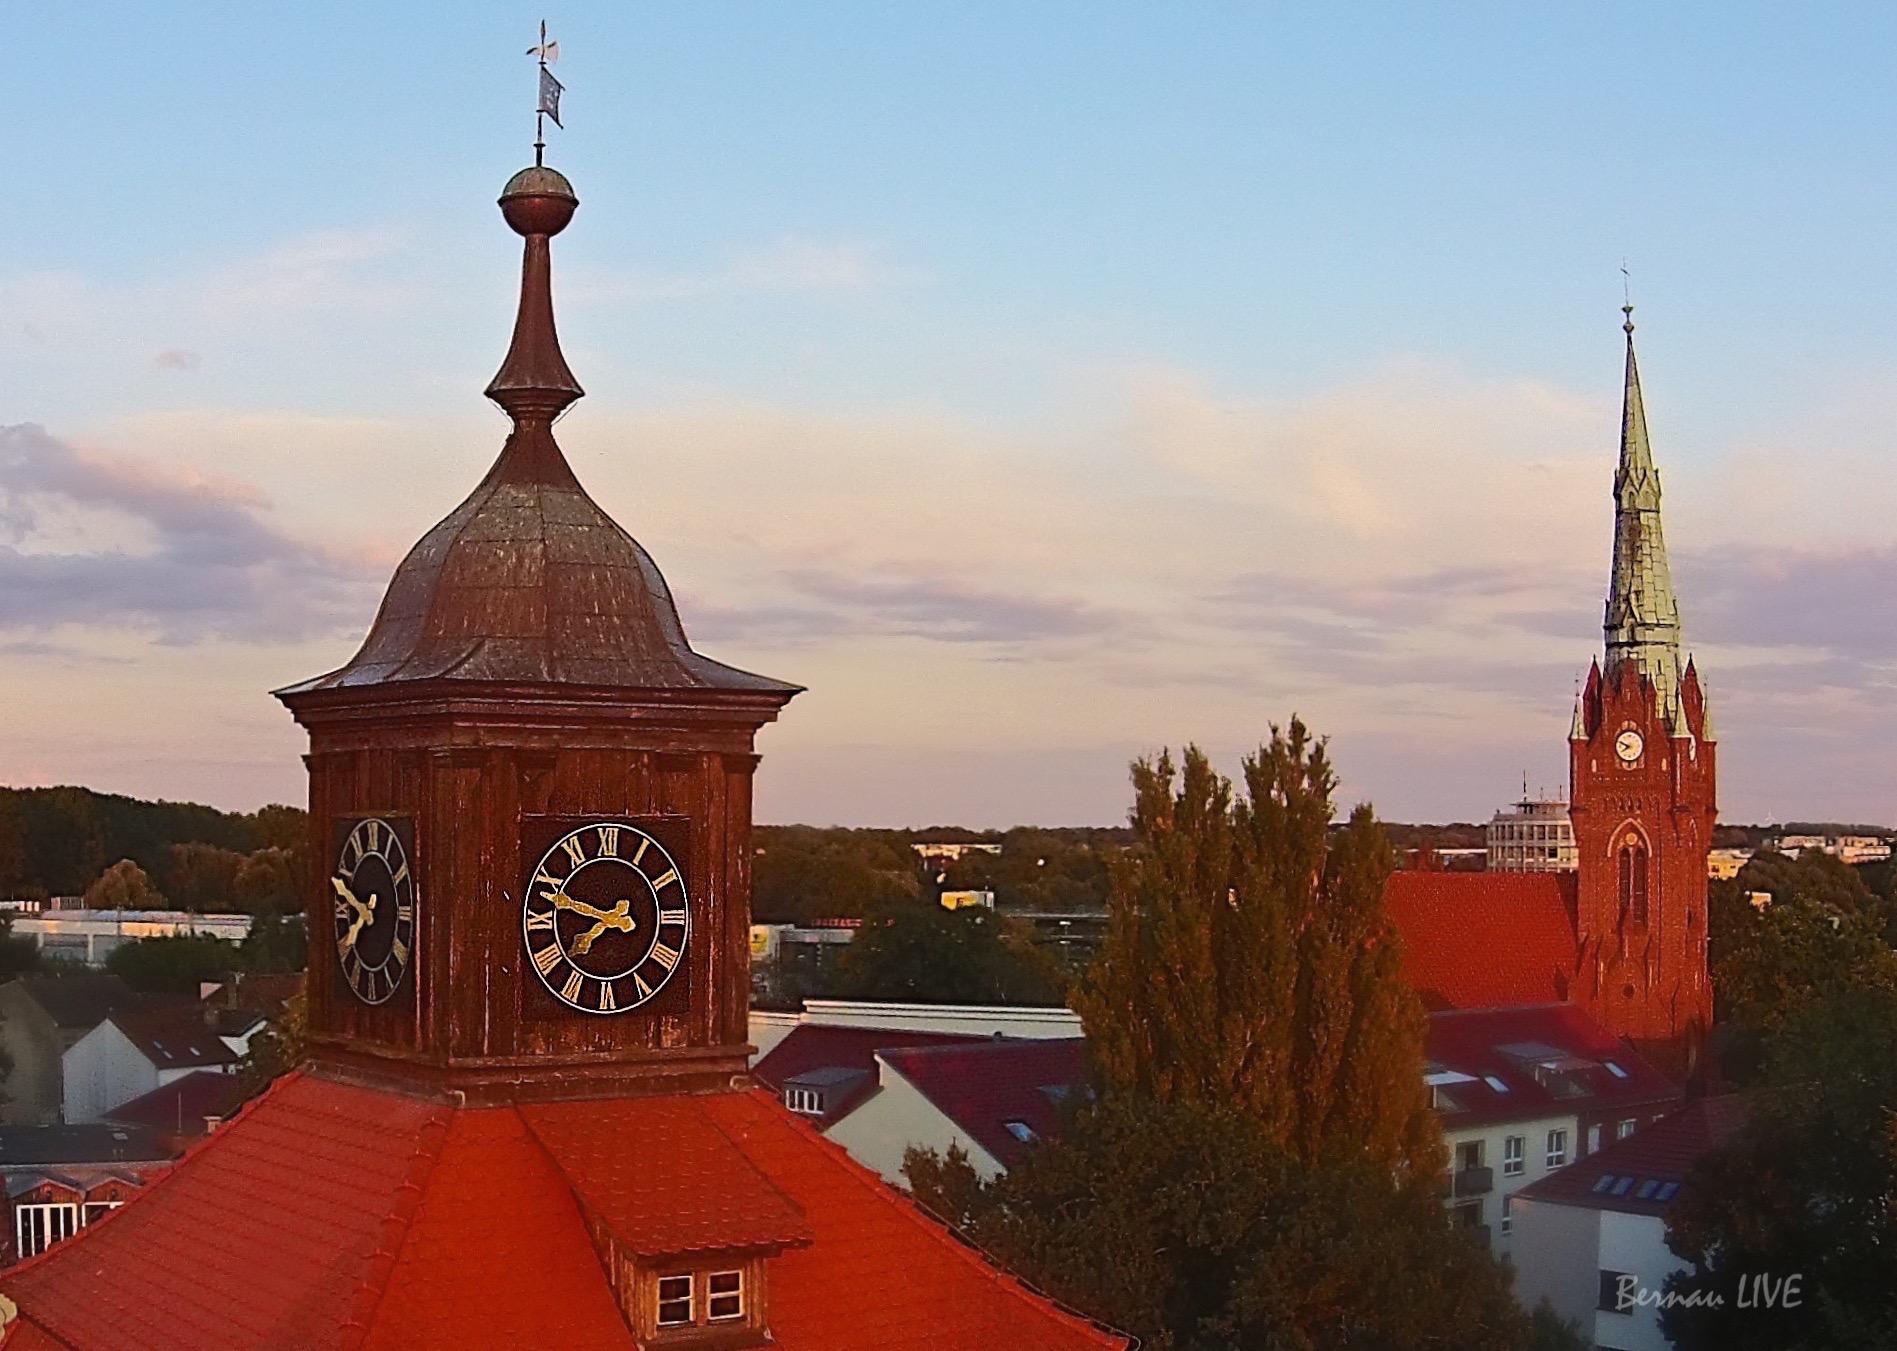 Bernau-Barnim, Bernau, Luftbild Bernau, Barnim, Innenstadt Bernau, Panorama Bernau